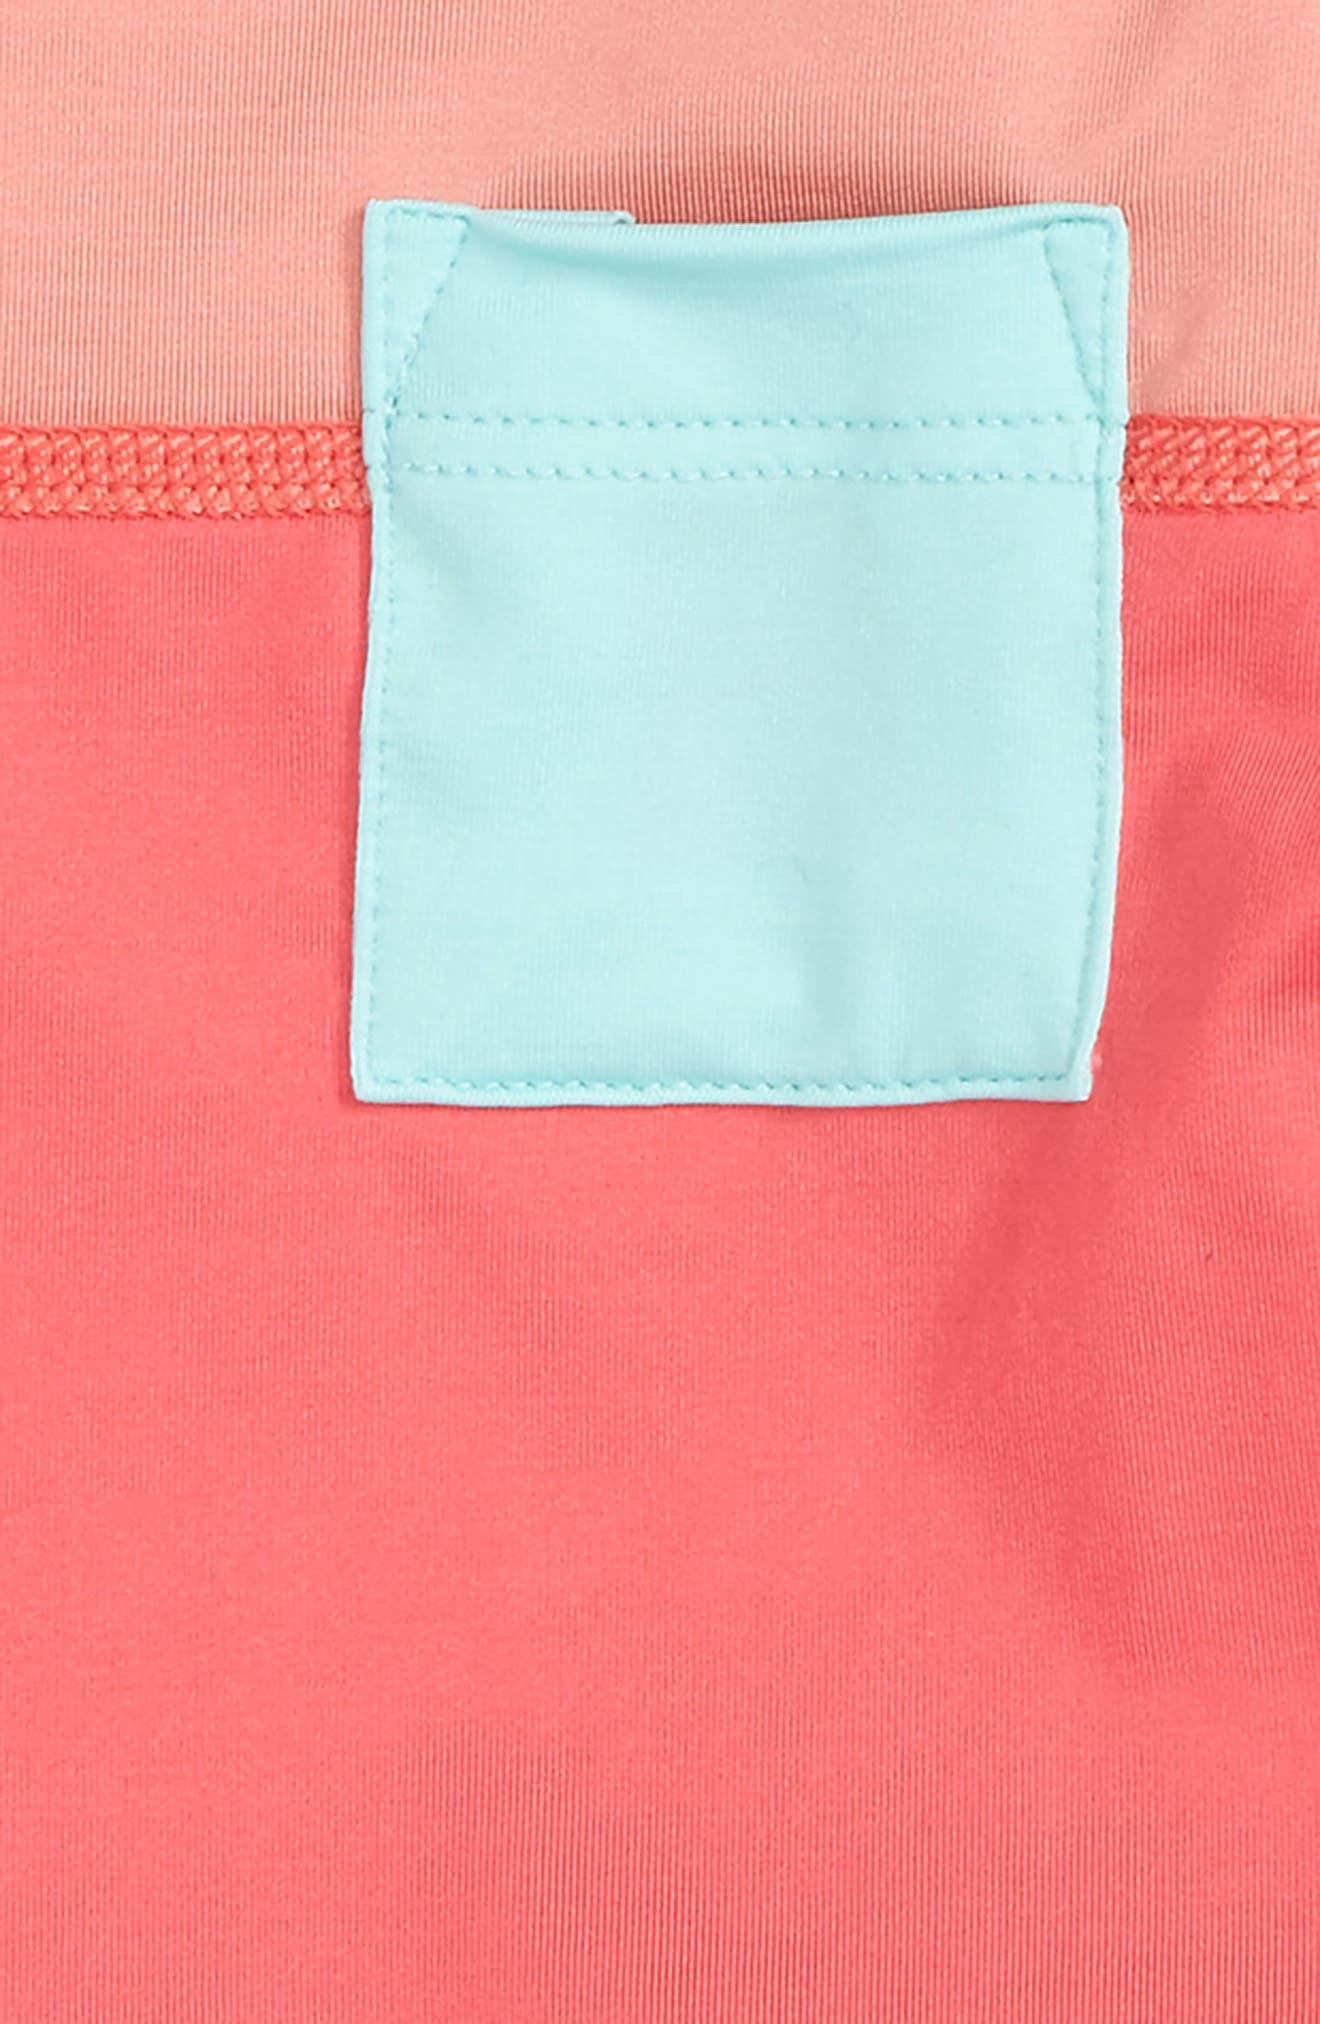 'Little Sol' Two-Piece Rashguard Swimsuit,                             Alternate thumbnail 2, color,                             652